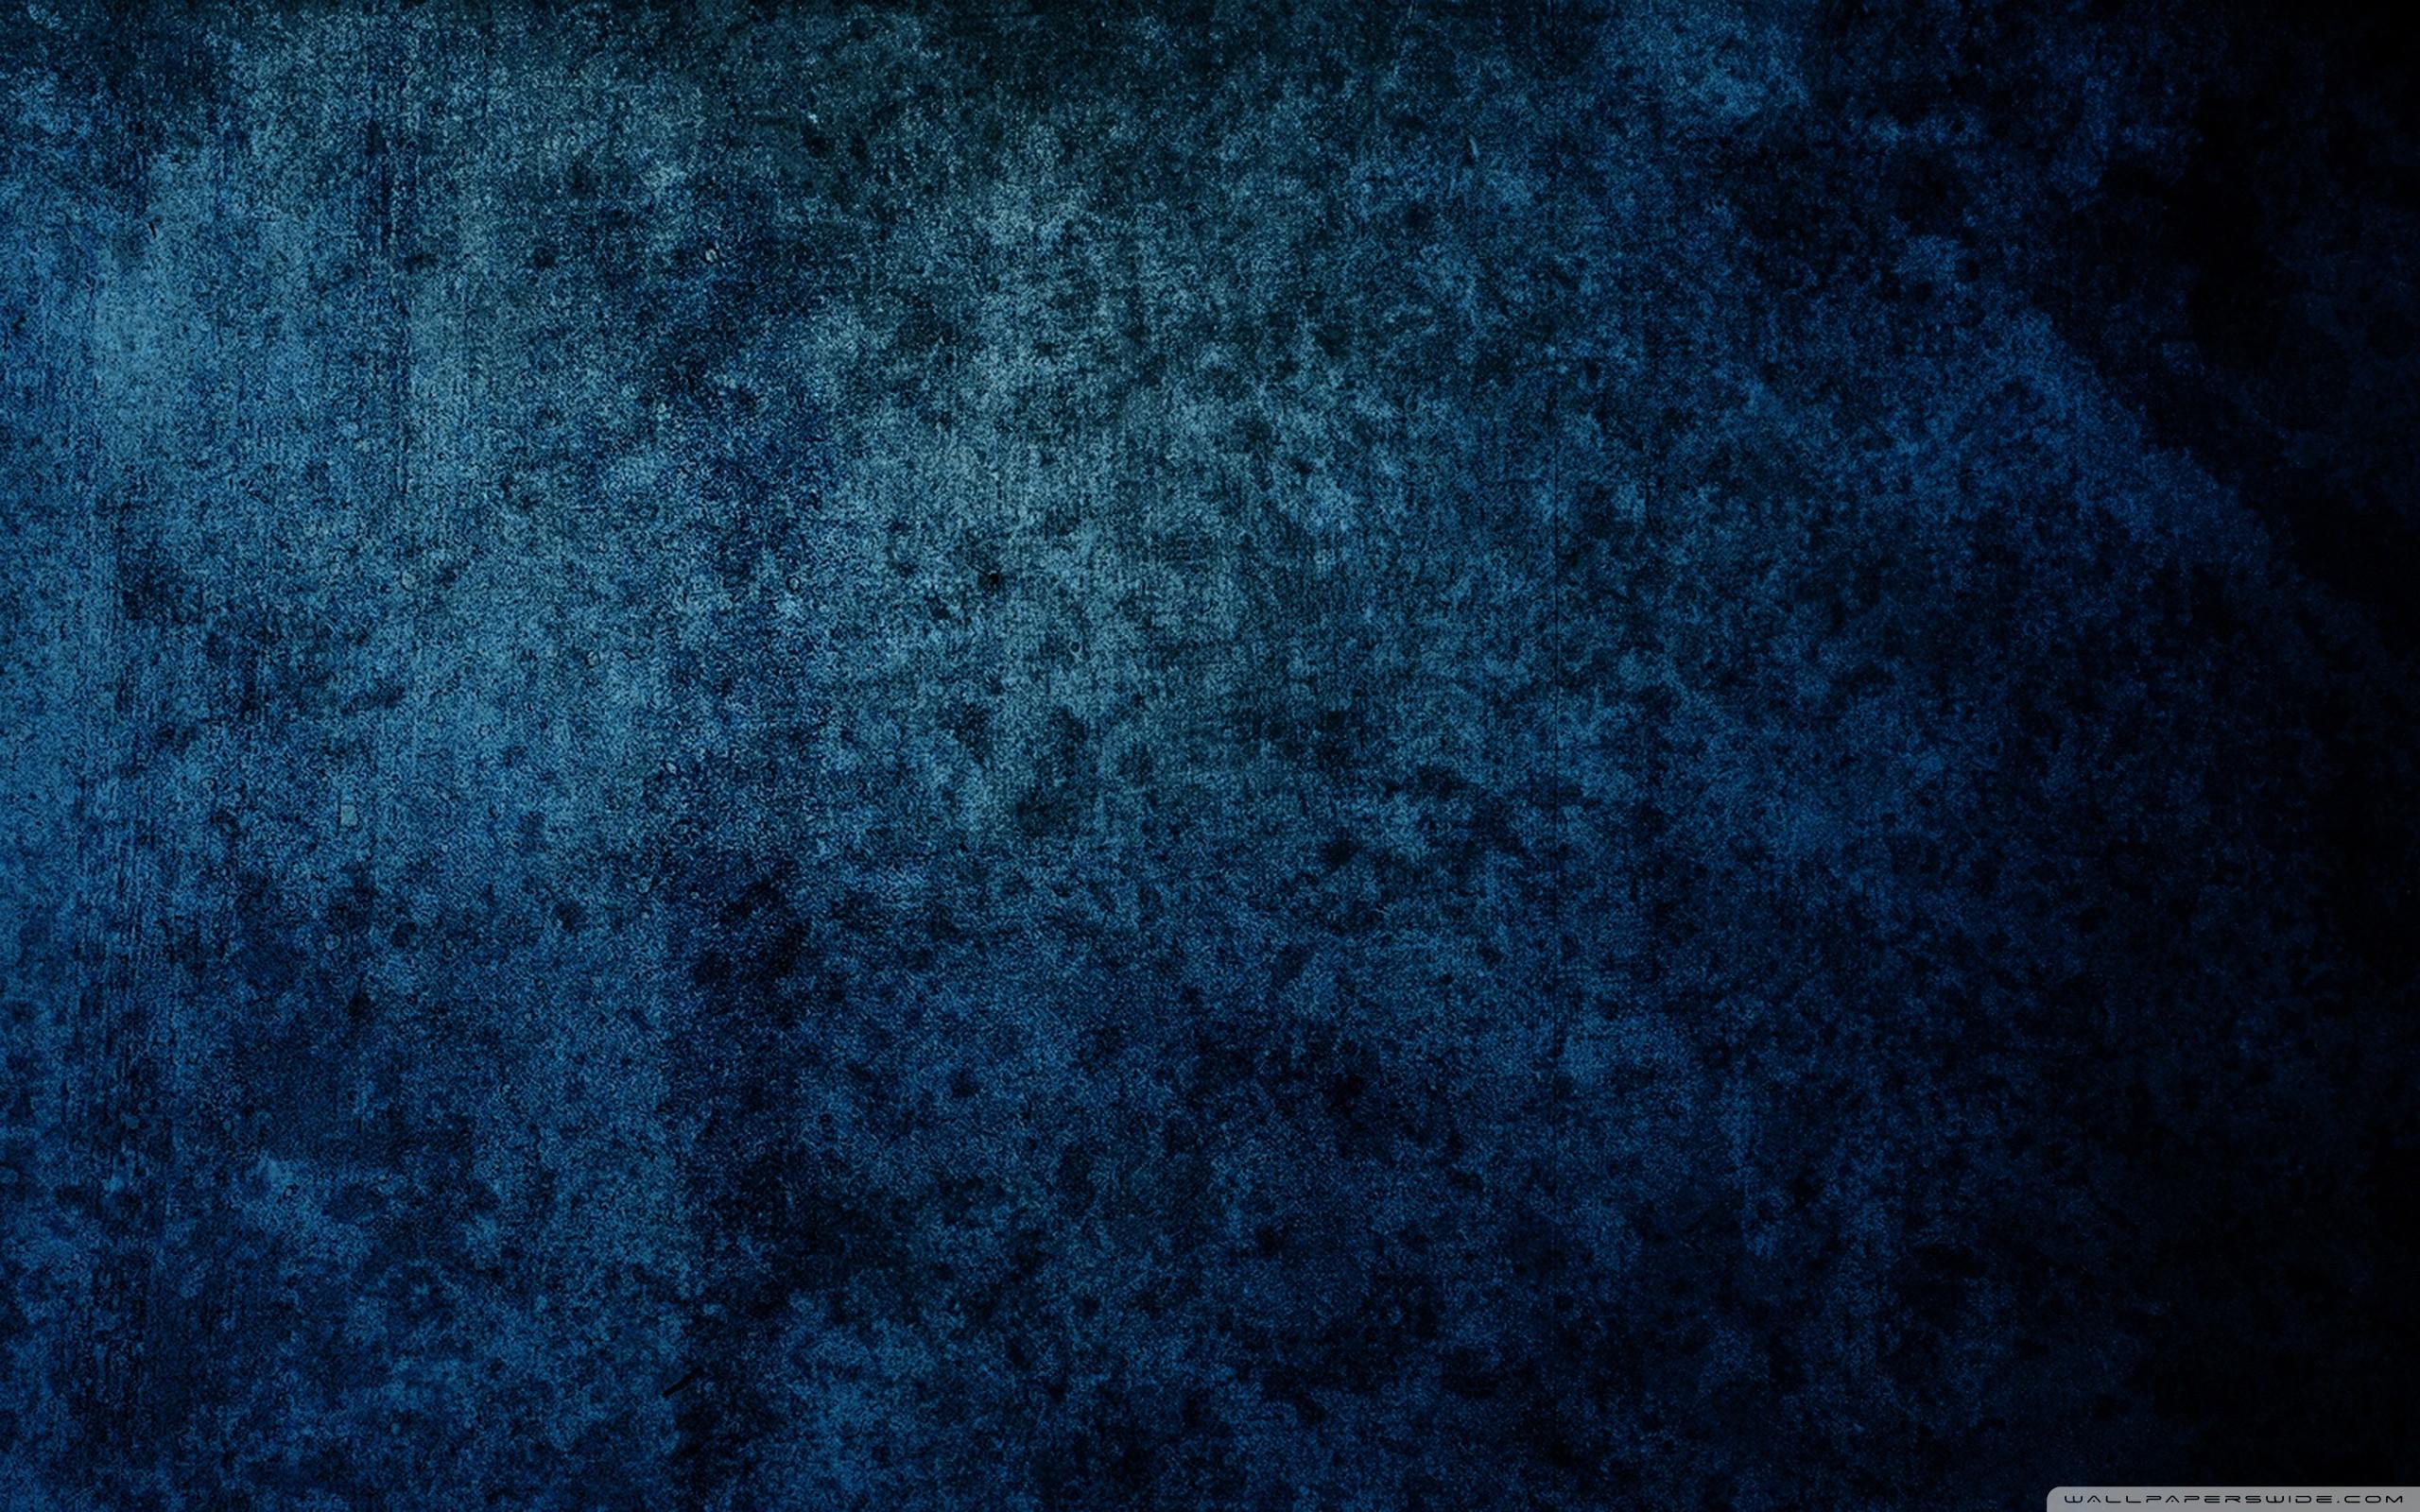 Grunge background download free amazing full hd backgrounds 2560x1600 new grunge background 2560x1600 hd for mobile voltagebd Choice Image